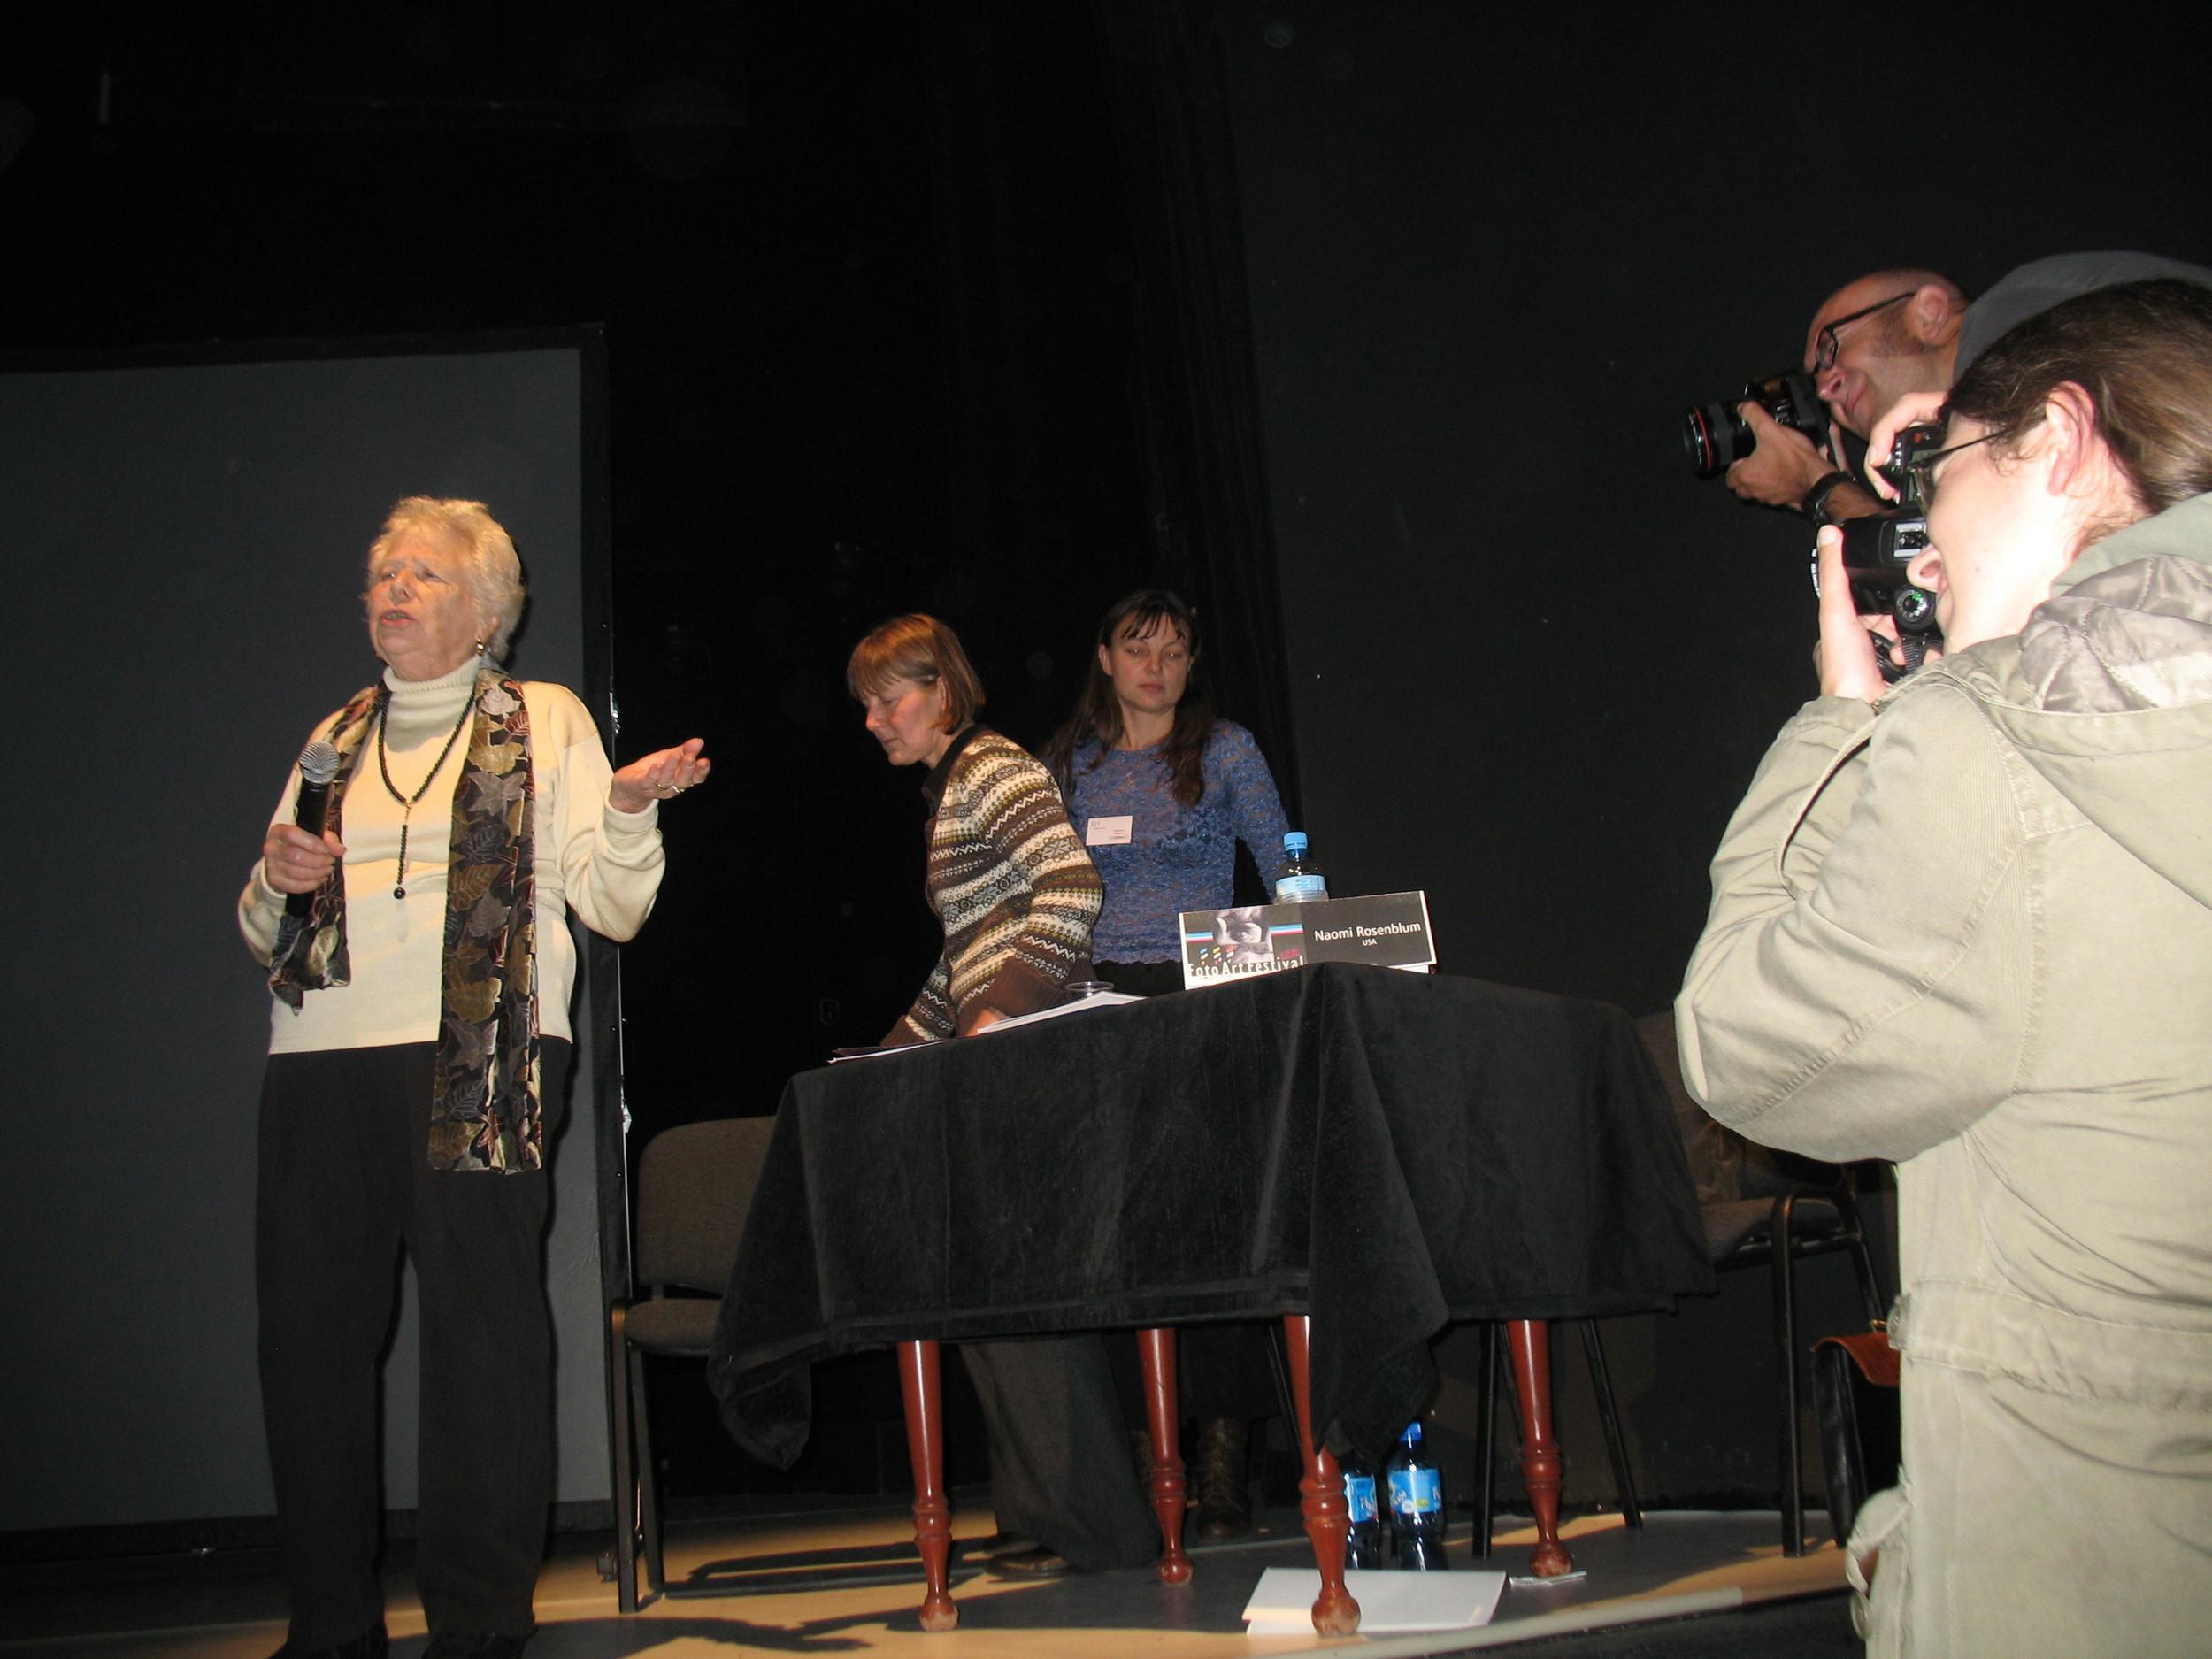 Naomi Rosenblum speaking at Foto Art Festival, Poland